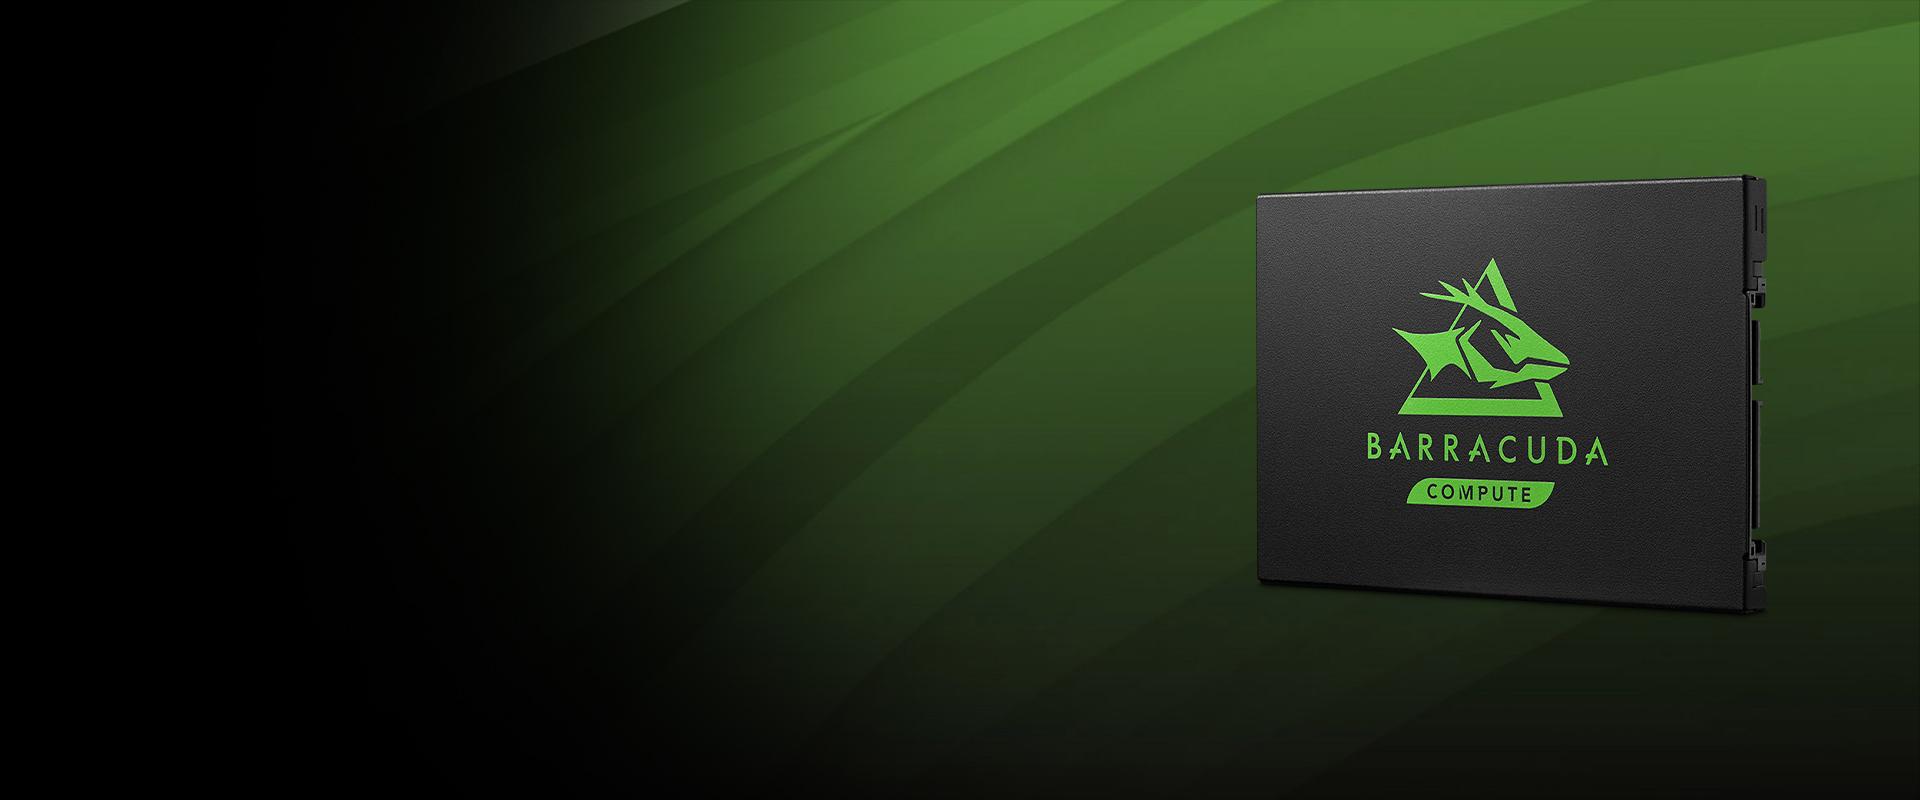 Customize an ORIGIN PC with a 1TB Seagate BarraCuda SSD